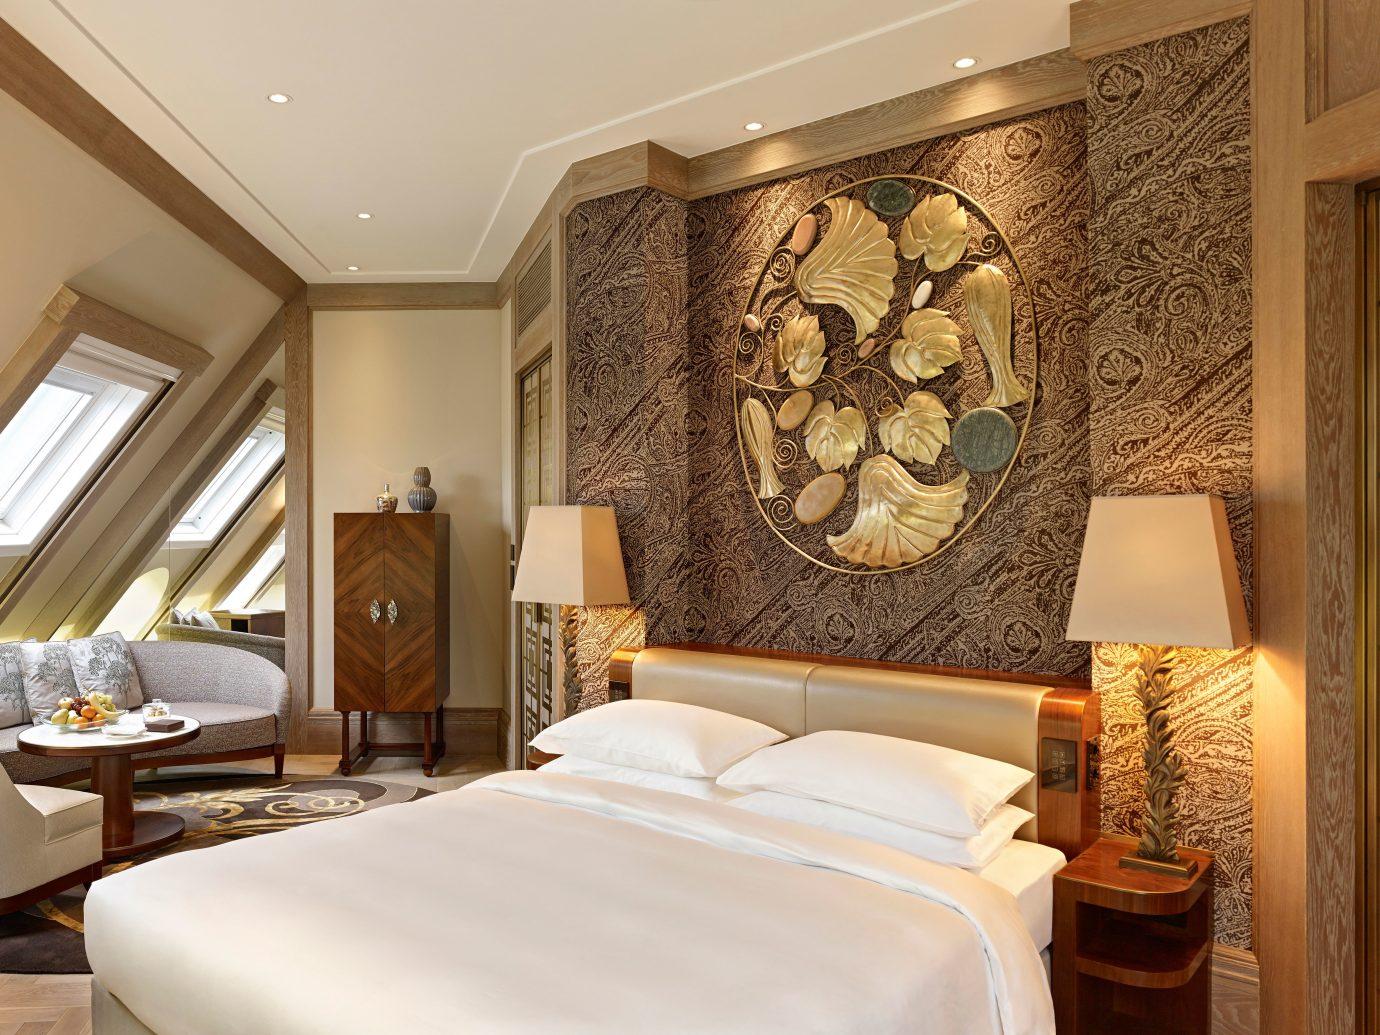 Austria Bedroom europe Hip Hotels Luxury Modern Suite Vienna indoor wall room property estate interior design floor cottage living room real estate mansion